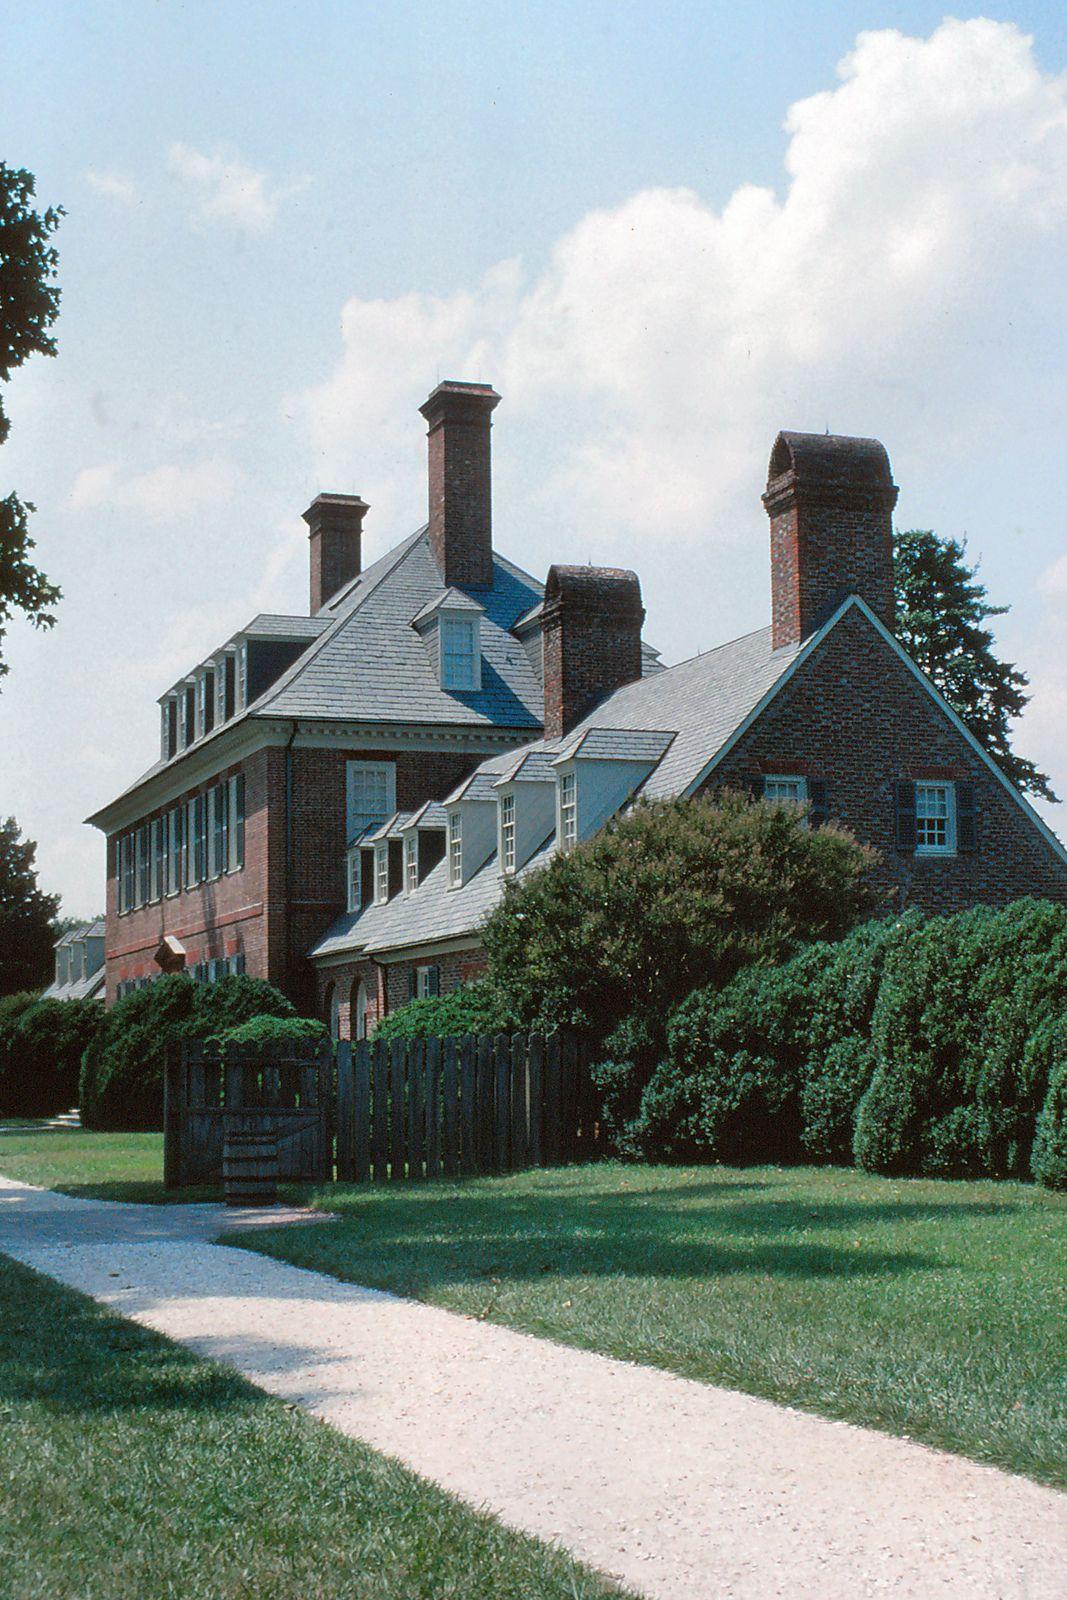 bourbonandroses Carter's Grove (1750), Williamsburg VA